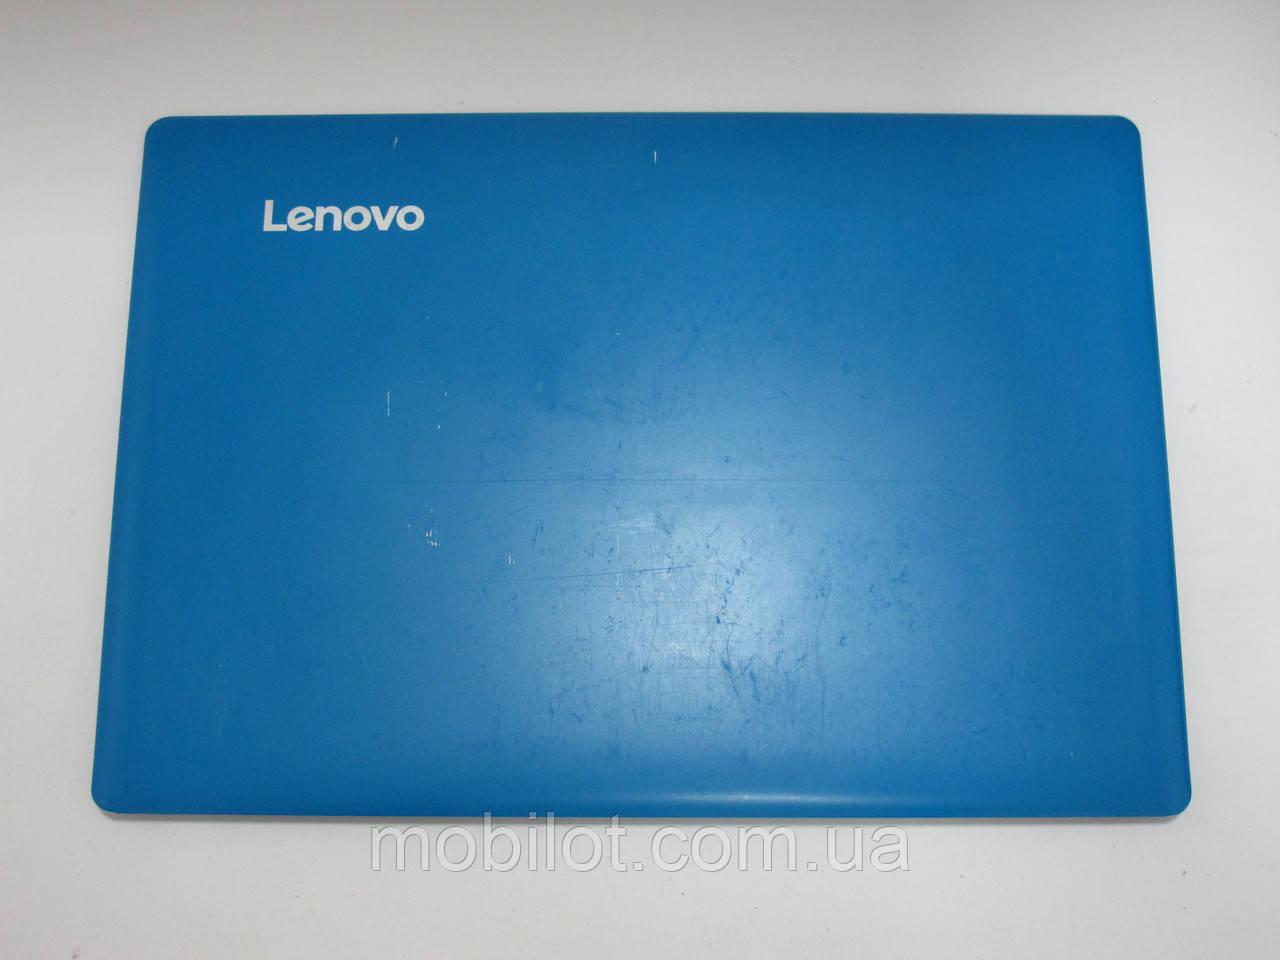 Часть корпуса (Крышка матрицы) Lenovo 100S-11IBY (NZ-6736)